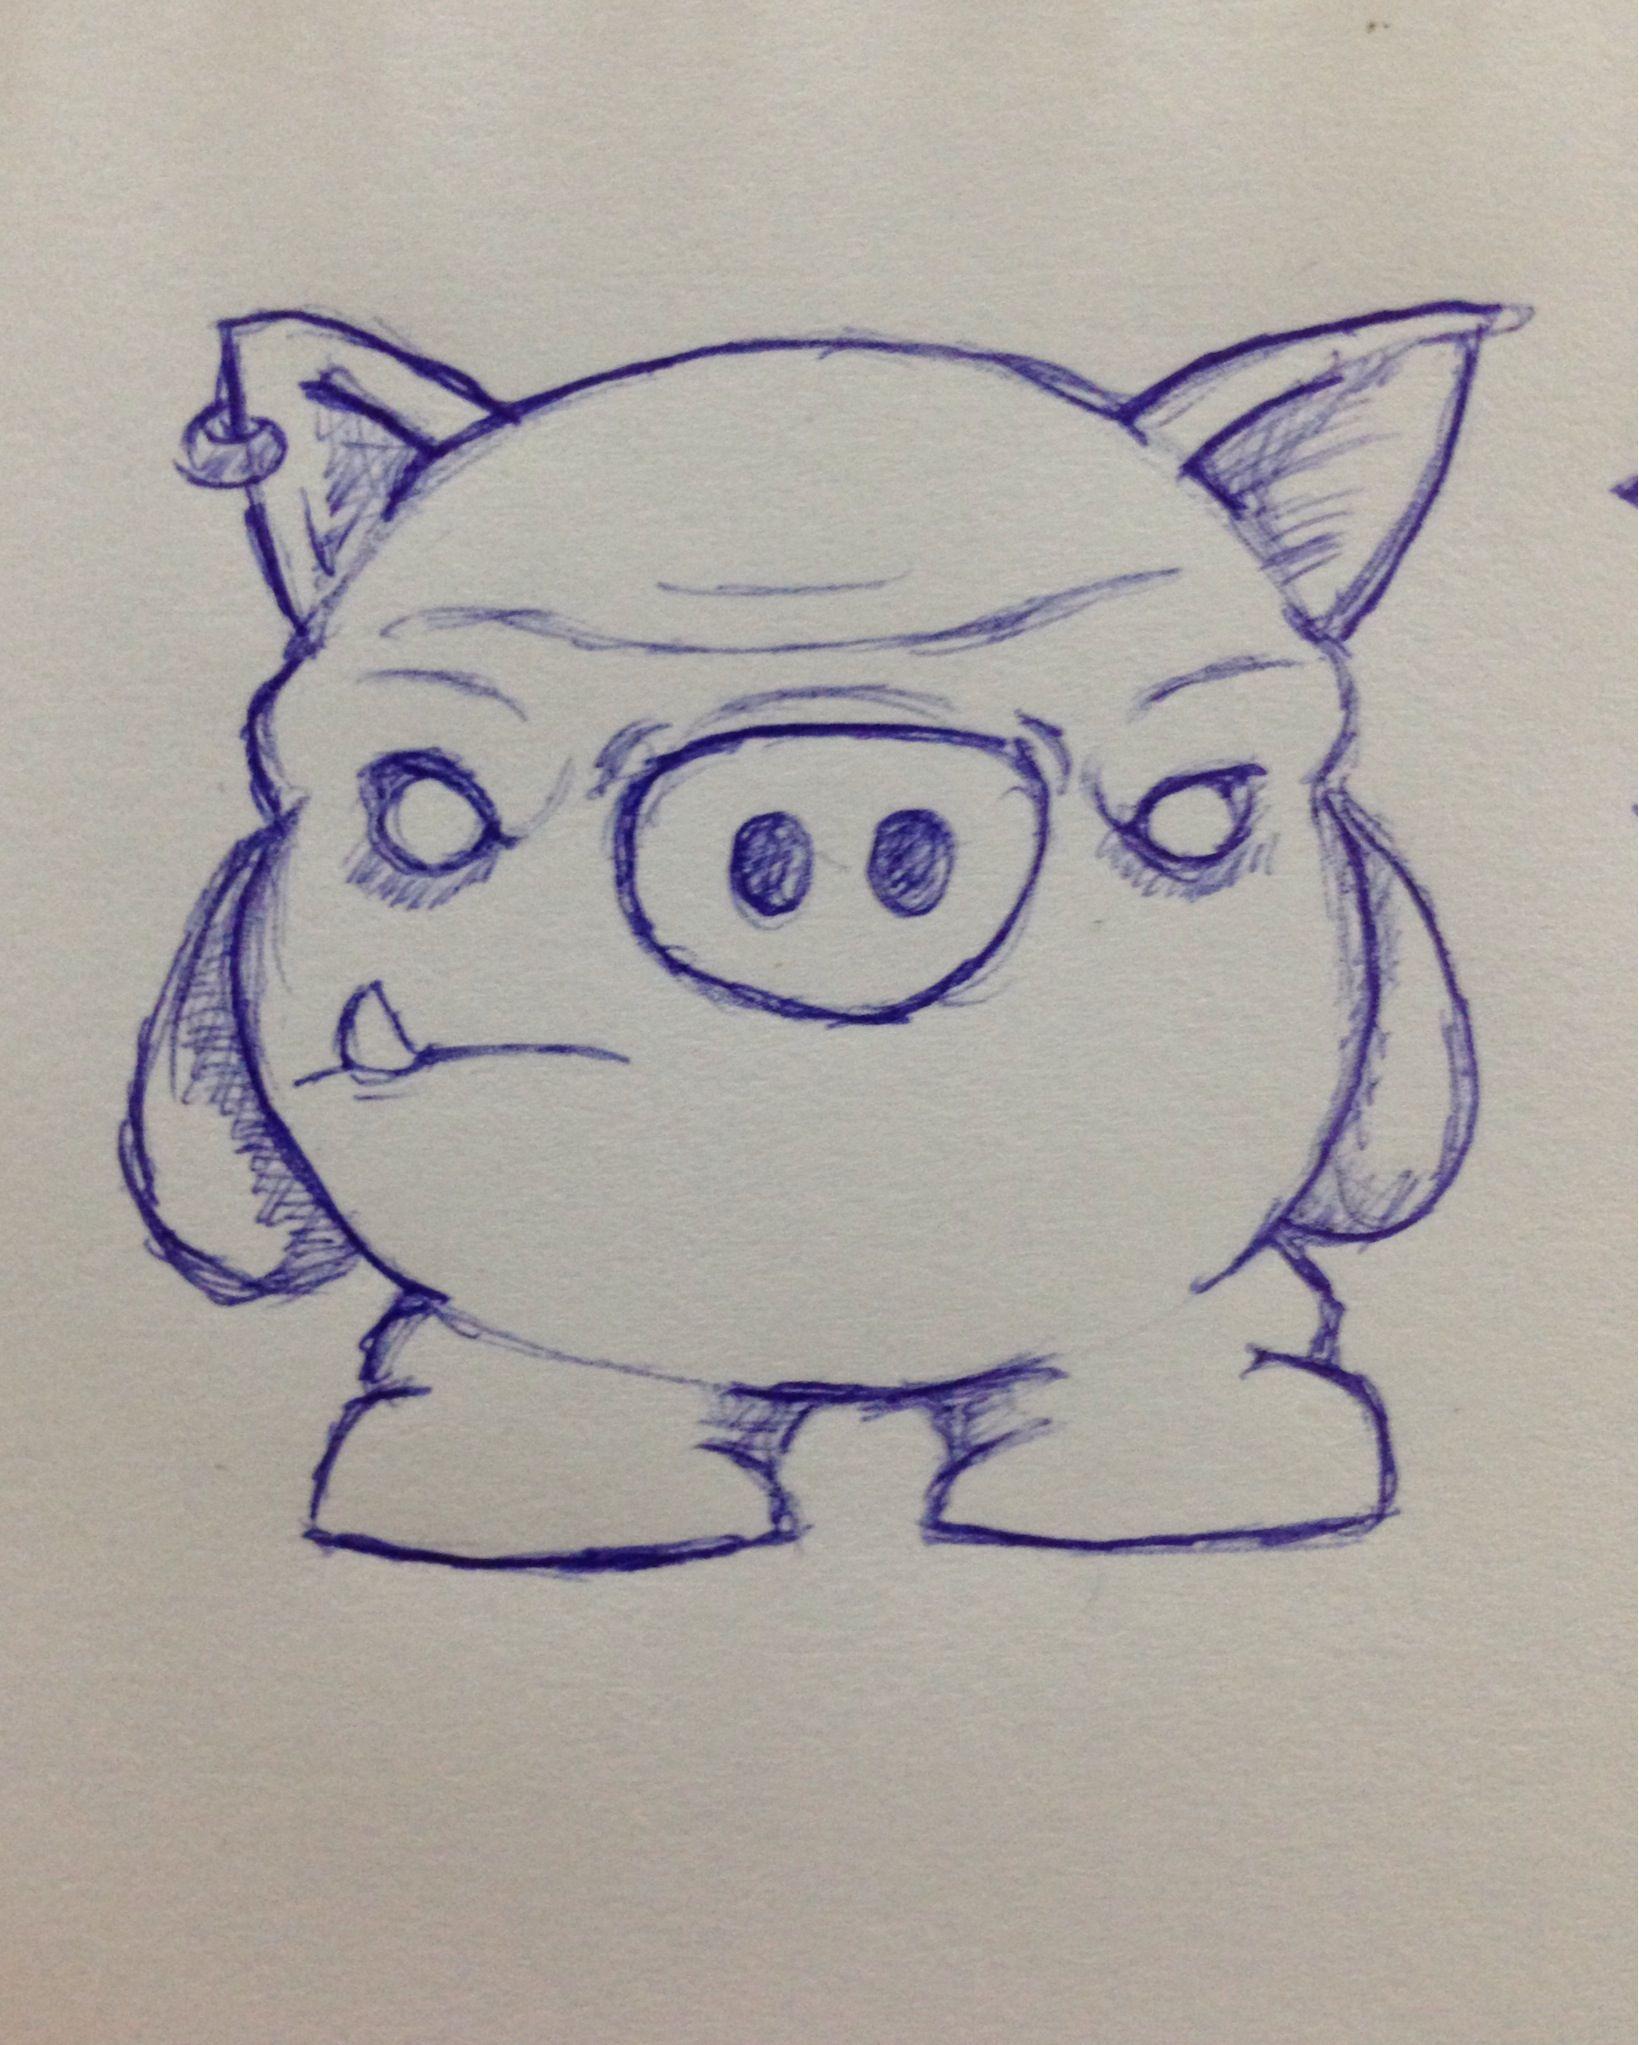 Evil pig pig drawing pig illustration pig art